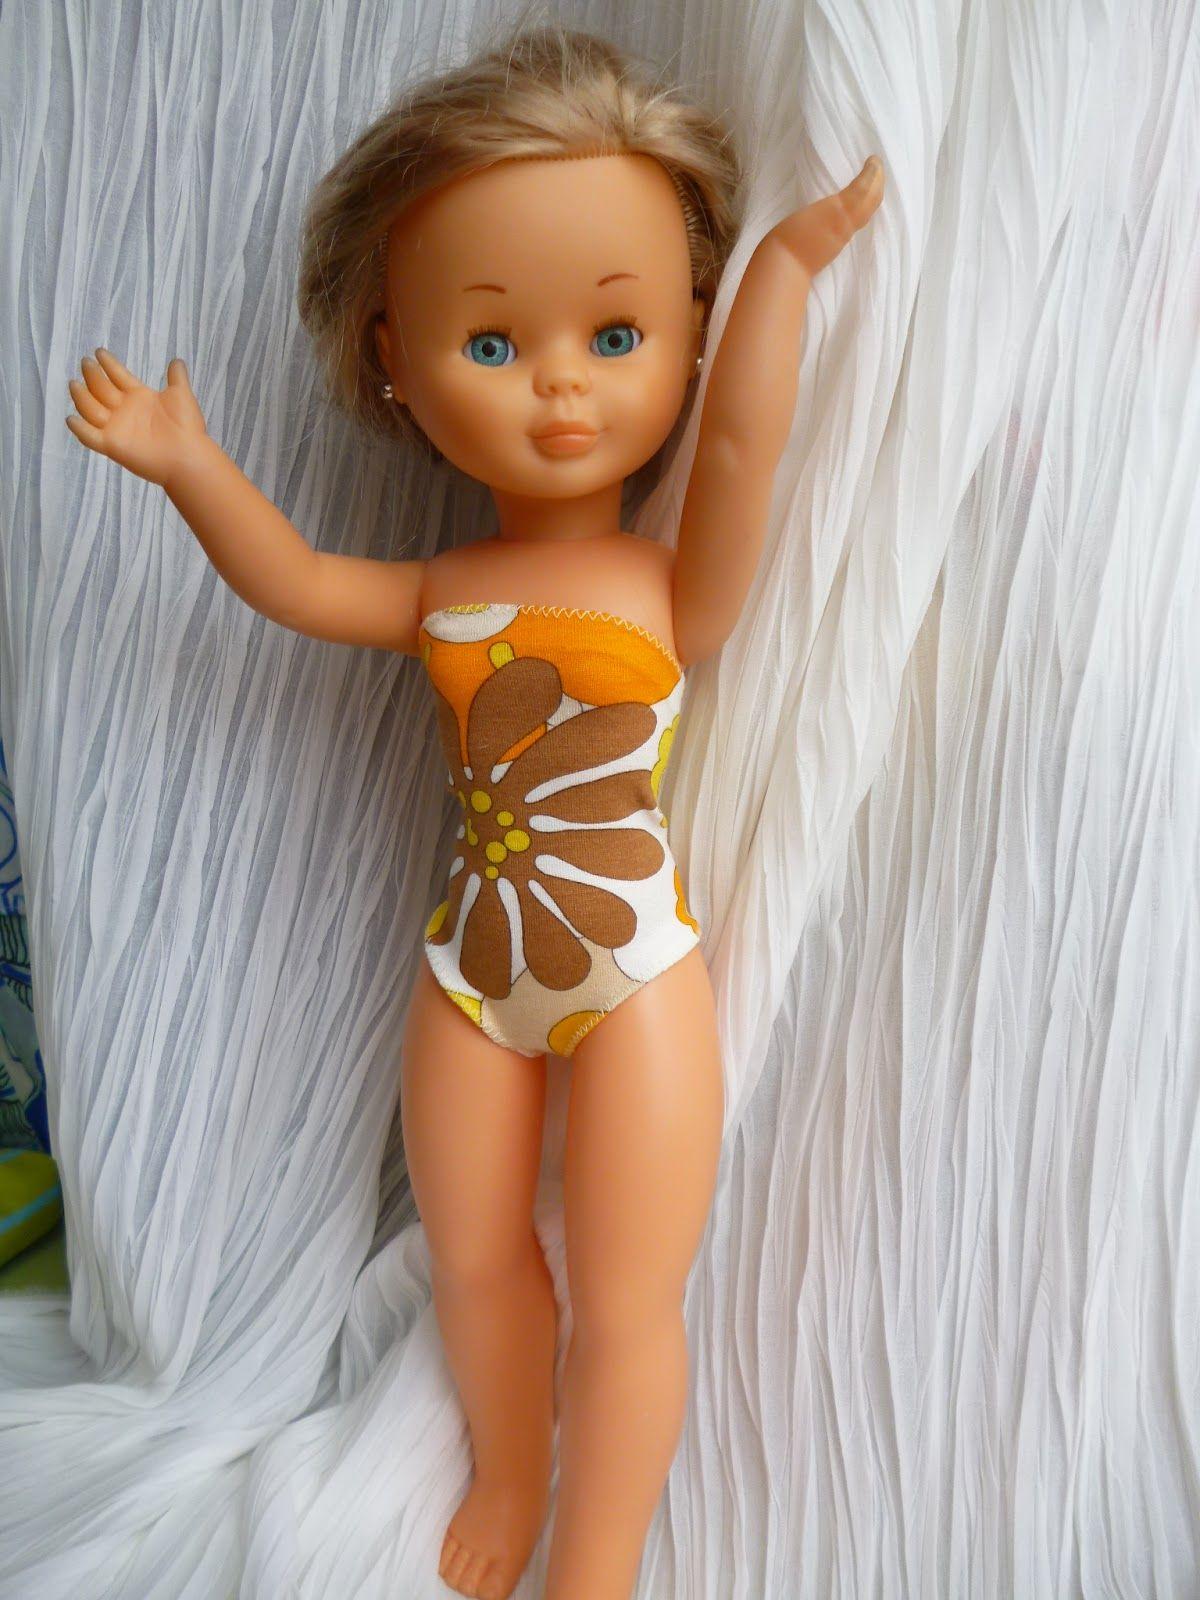 Muñeca Nancy Cose NancyTutorial Bañador Anilegra Para Nuestra ikZPuX